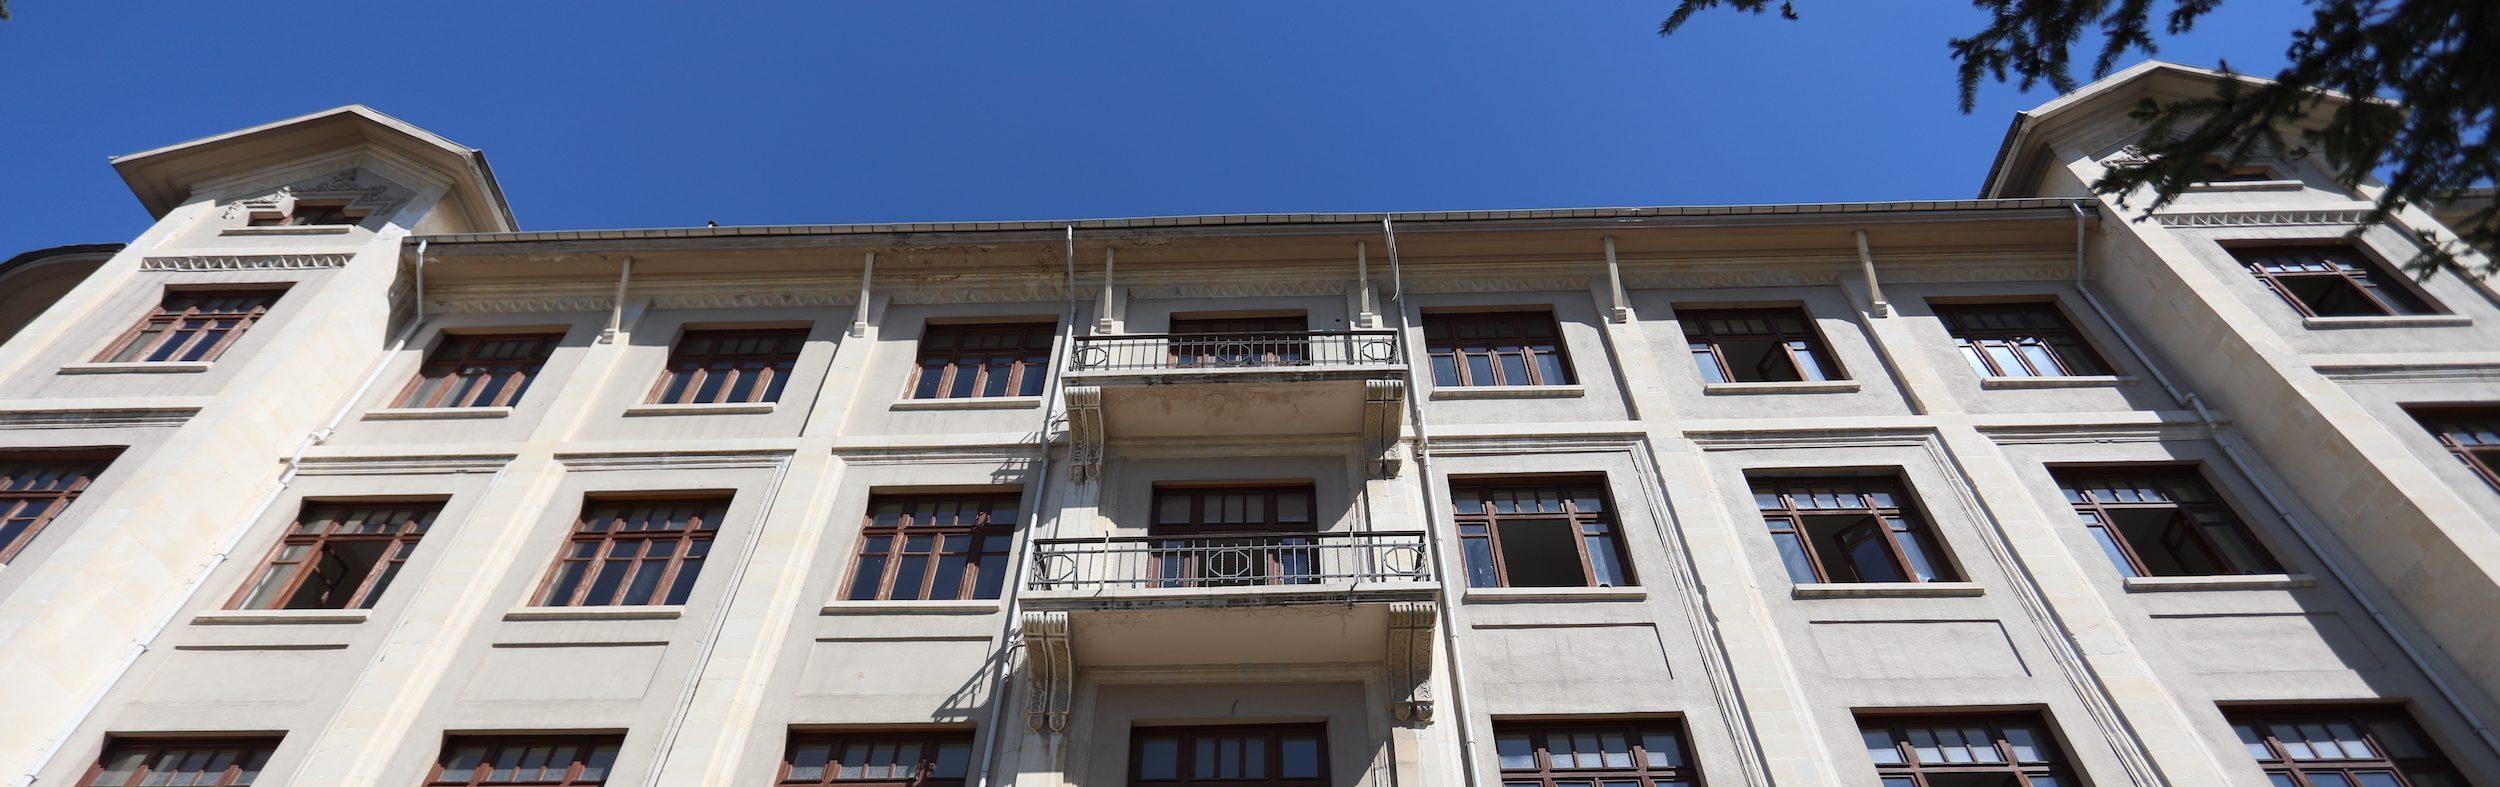 Ankara Medipol Üniversitesi